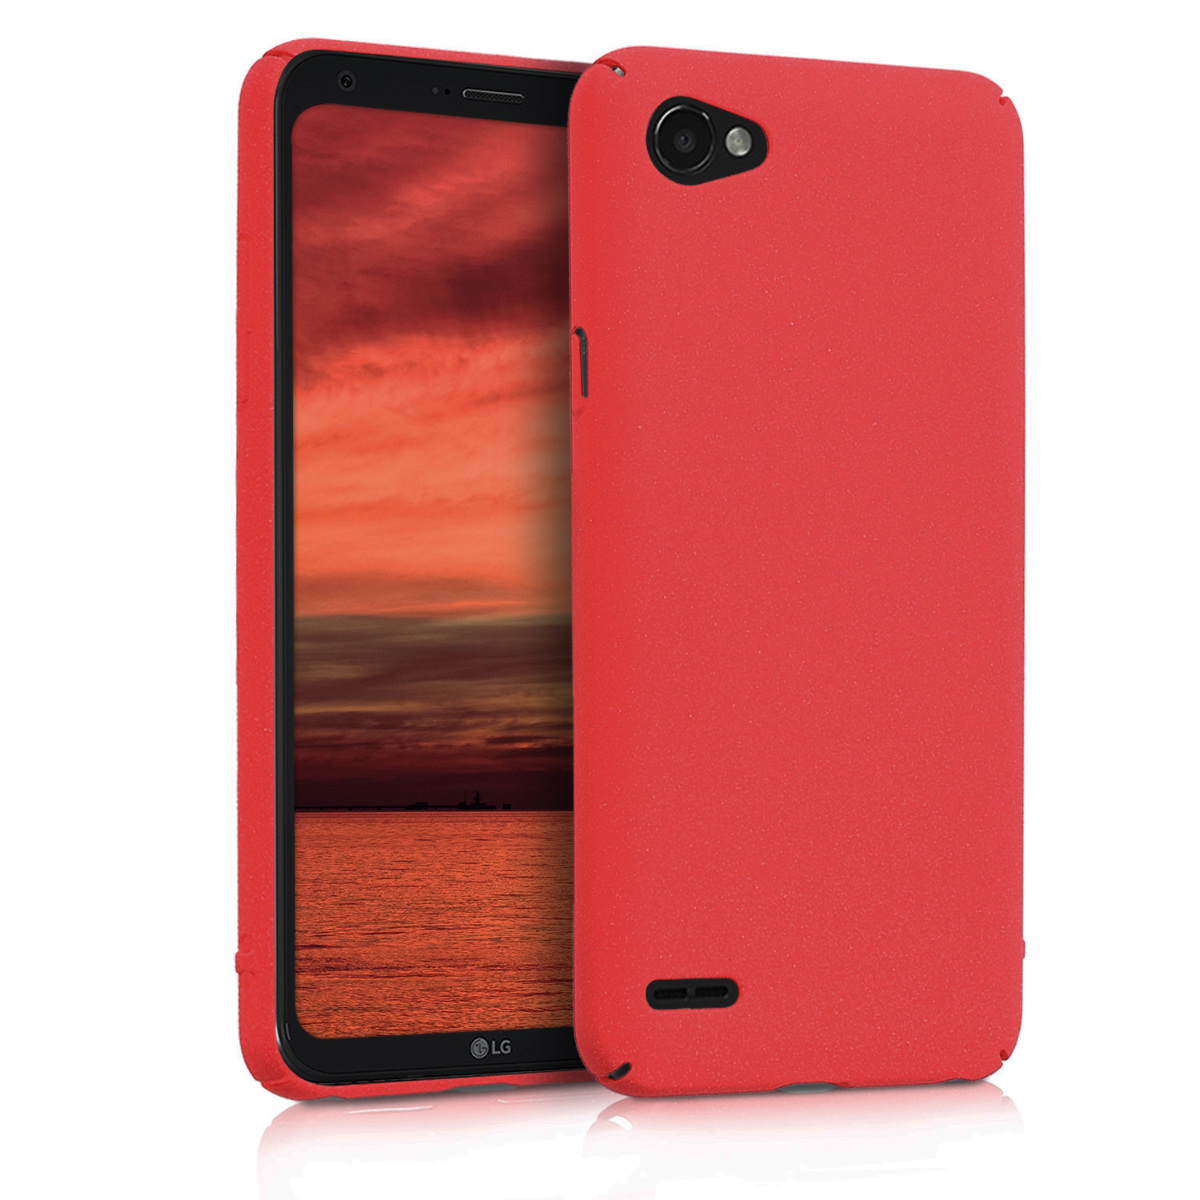 KW Slim Anti-Slip Cover - Σκληρή Θήκη Καουτσούκ LG Q6 - Κόκκινο μεταλλικό (44683.36)